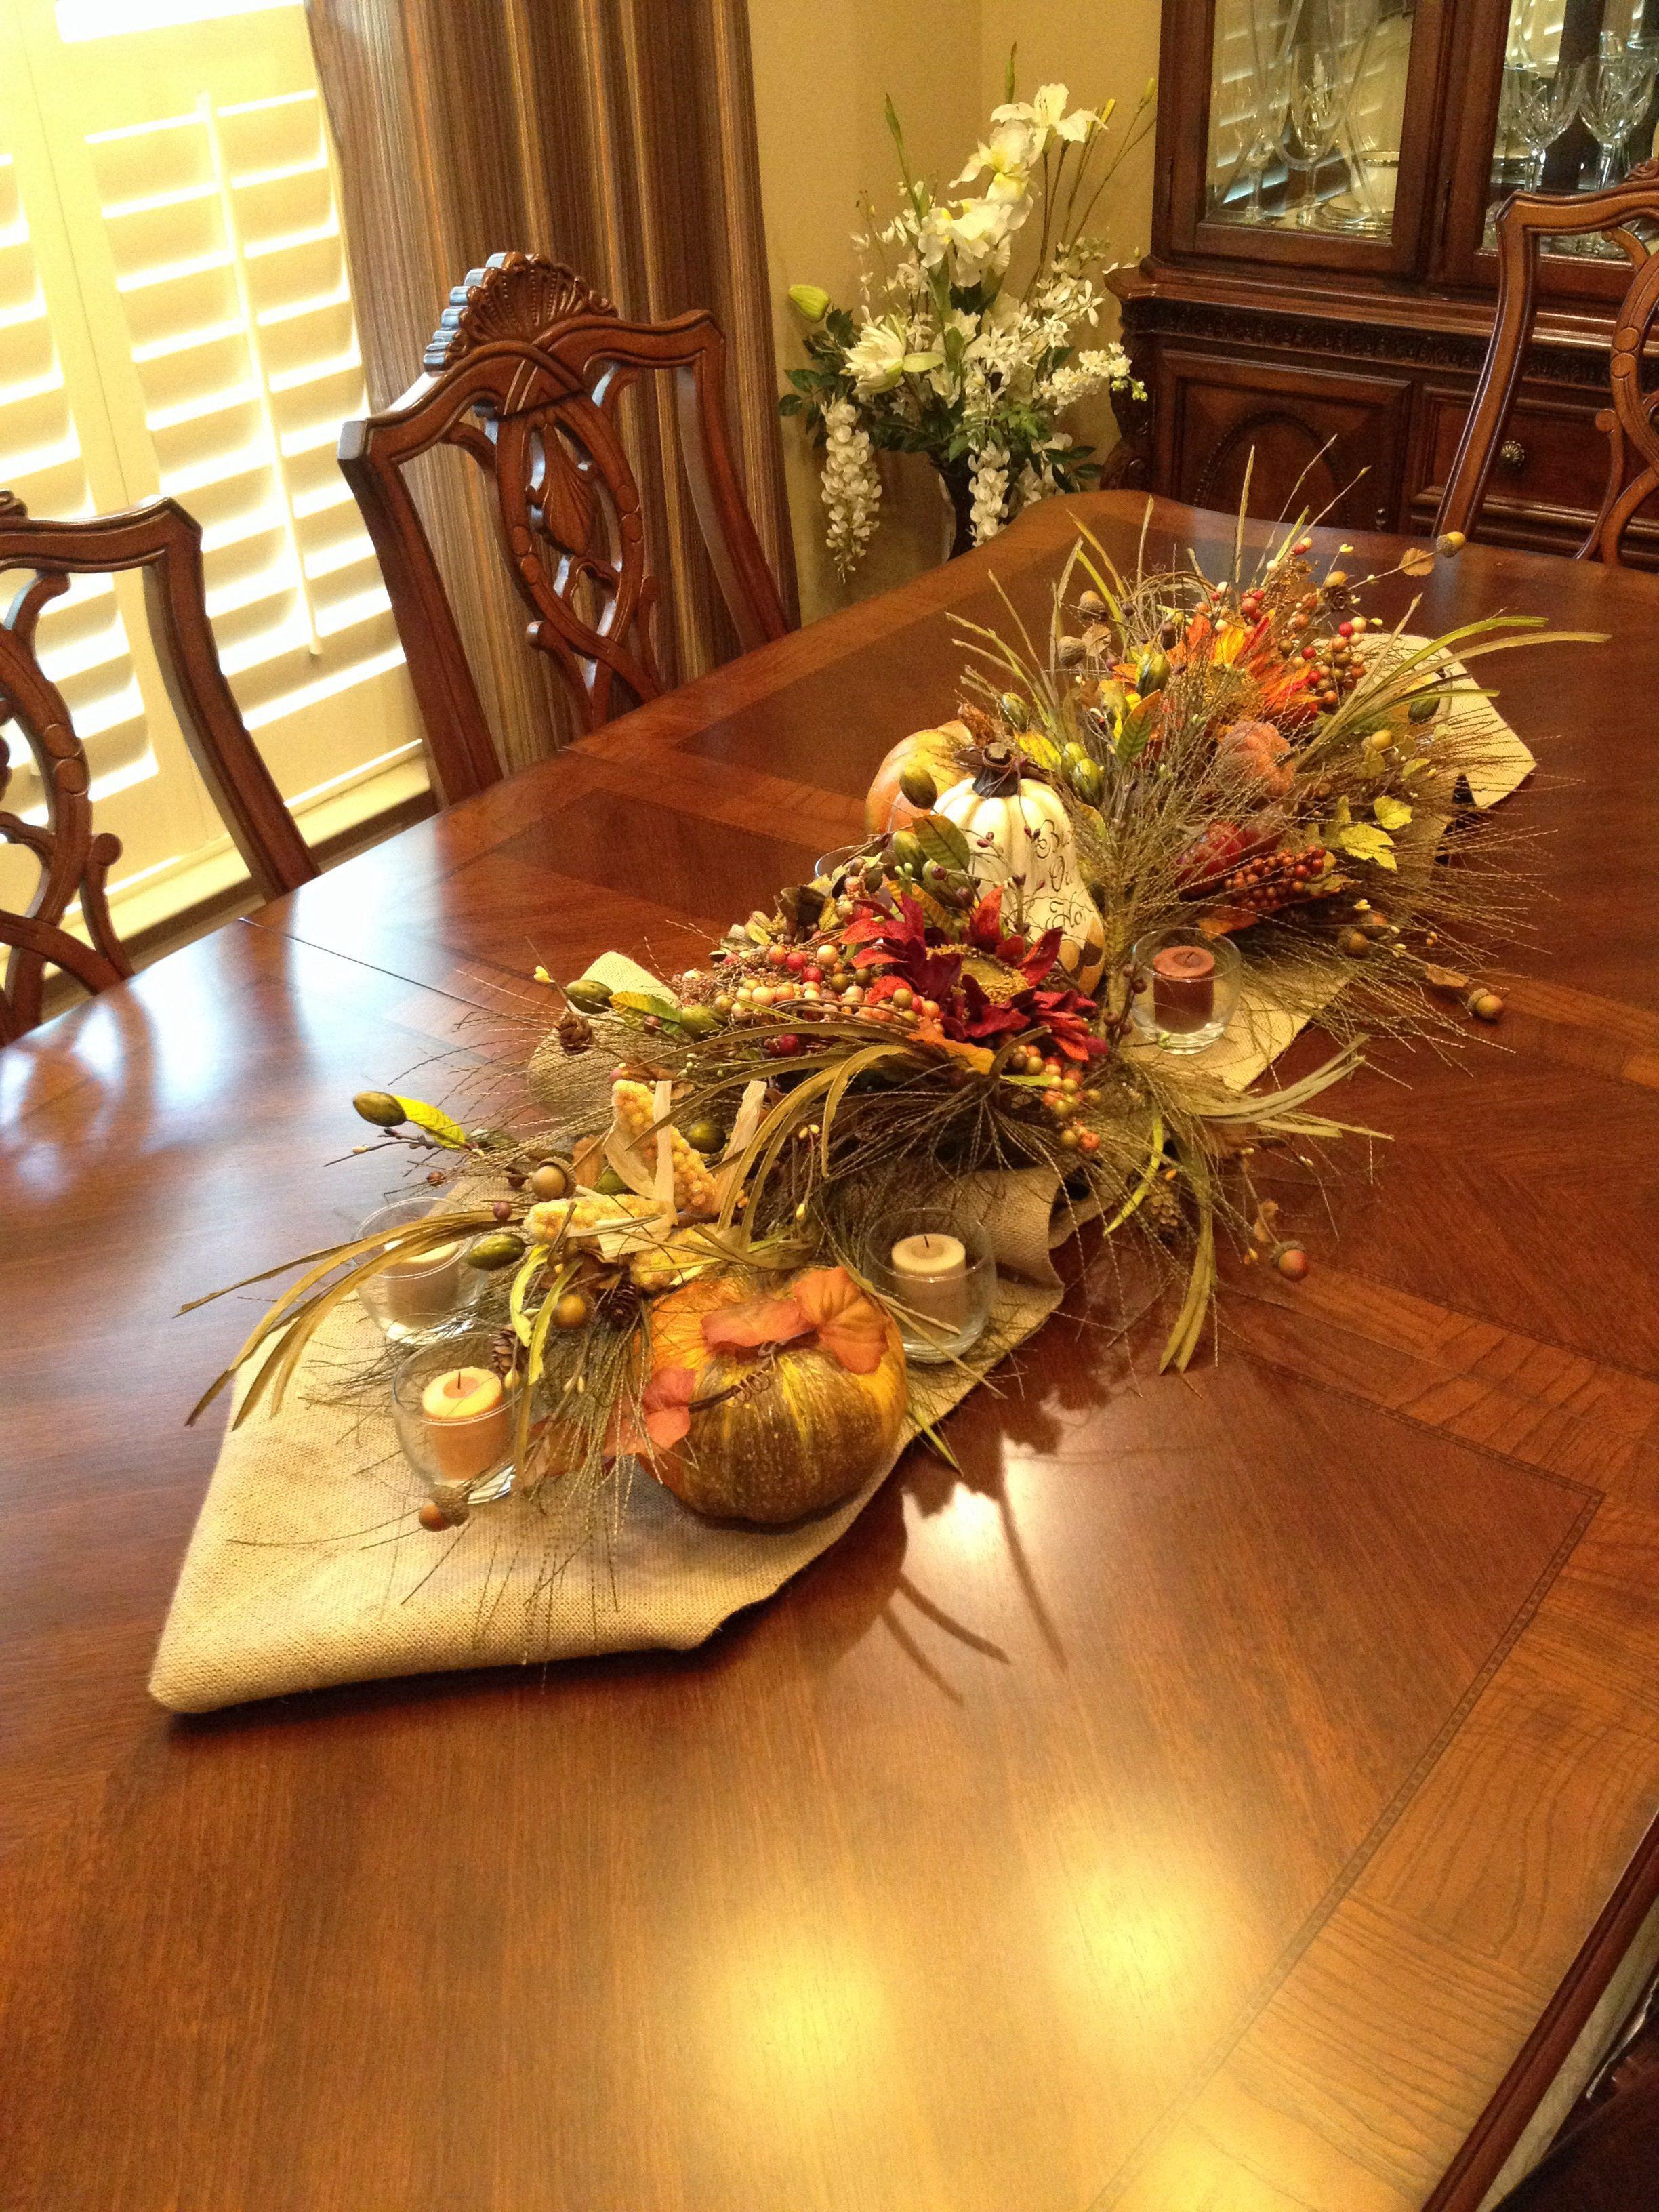 Harvest Table Centerpiece Fall Decor Inspiration Harvest Table Centerpieces Harvest Table Decor